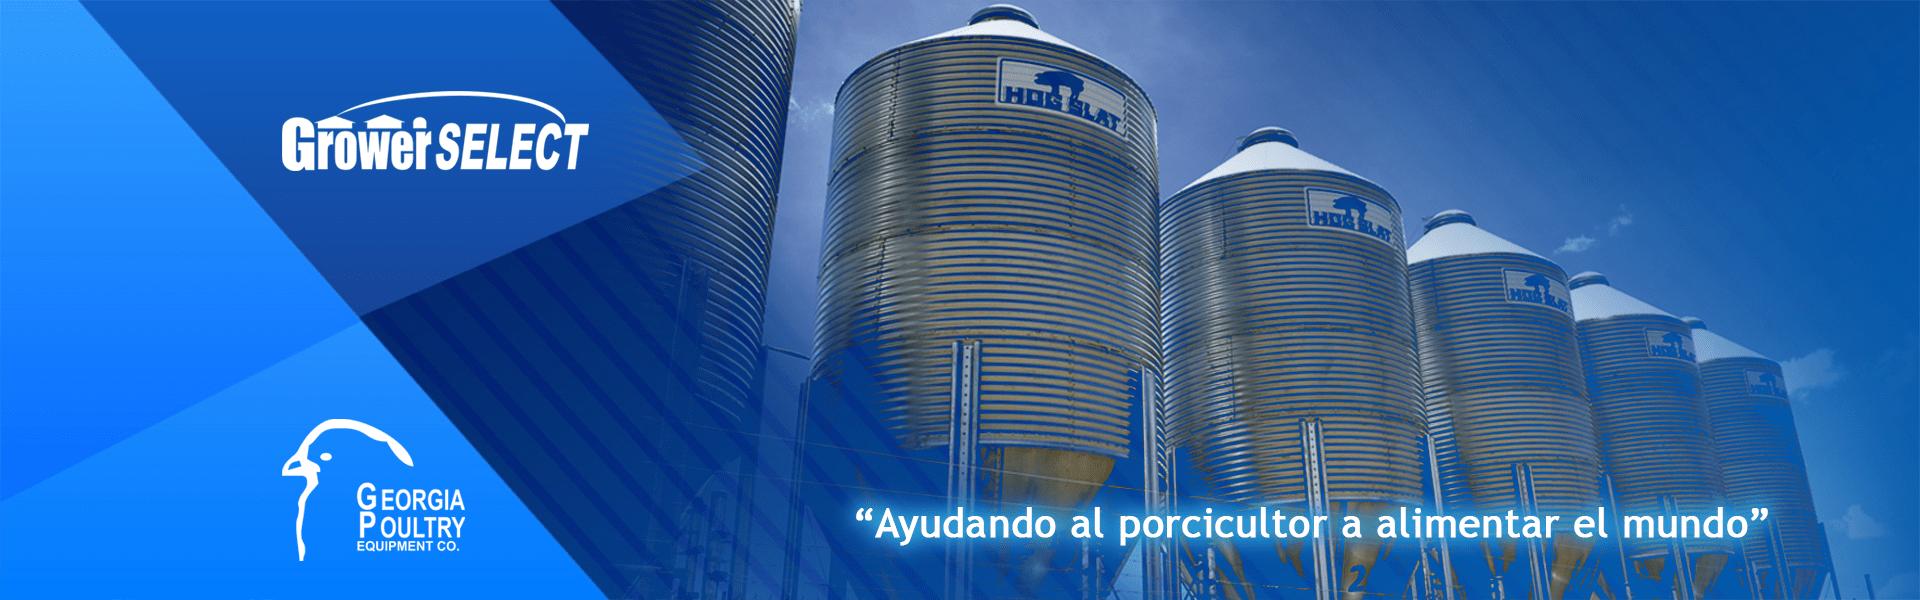 silos-grower-select